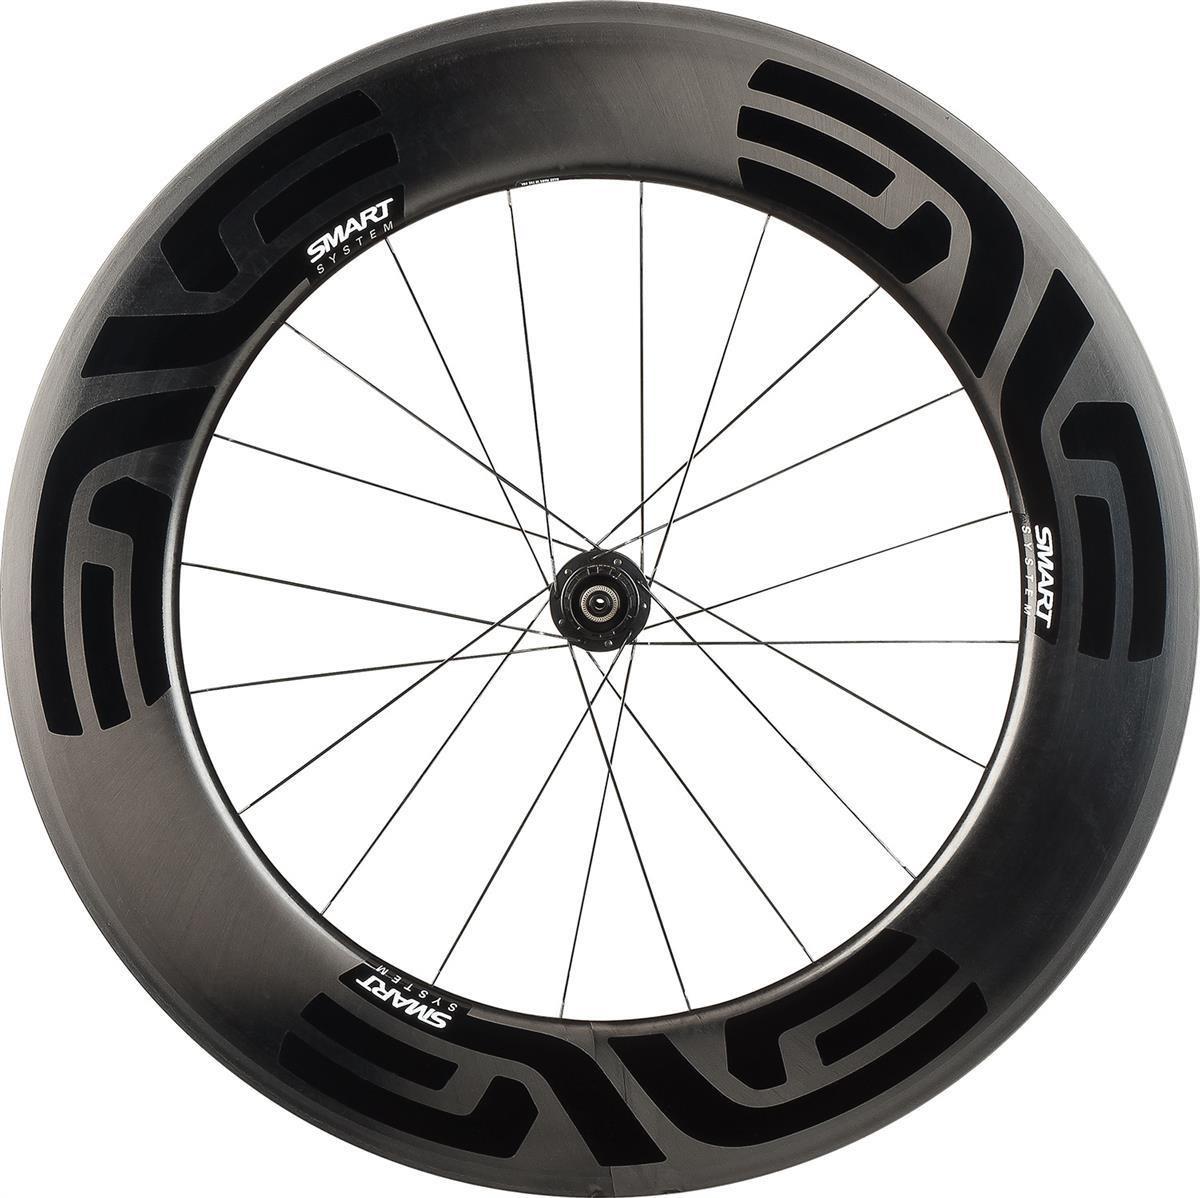 Enve 8.9 SES Tubular Rear Wheel   Rear wheel